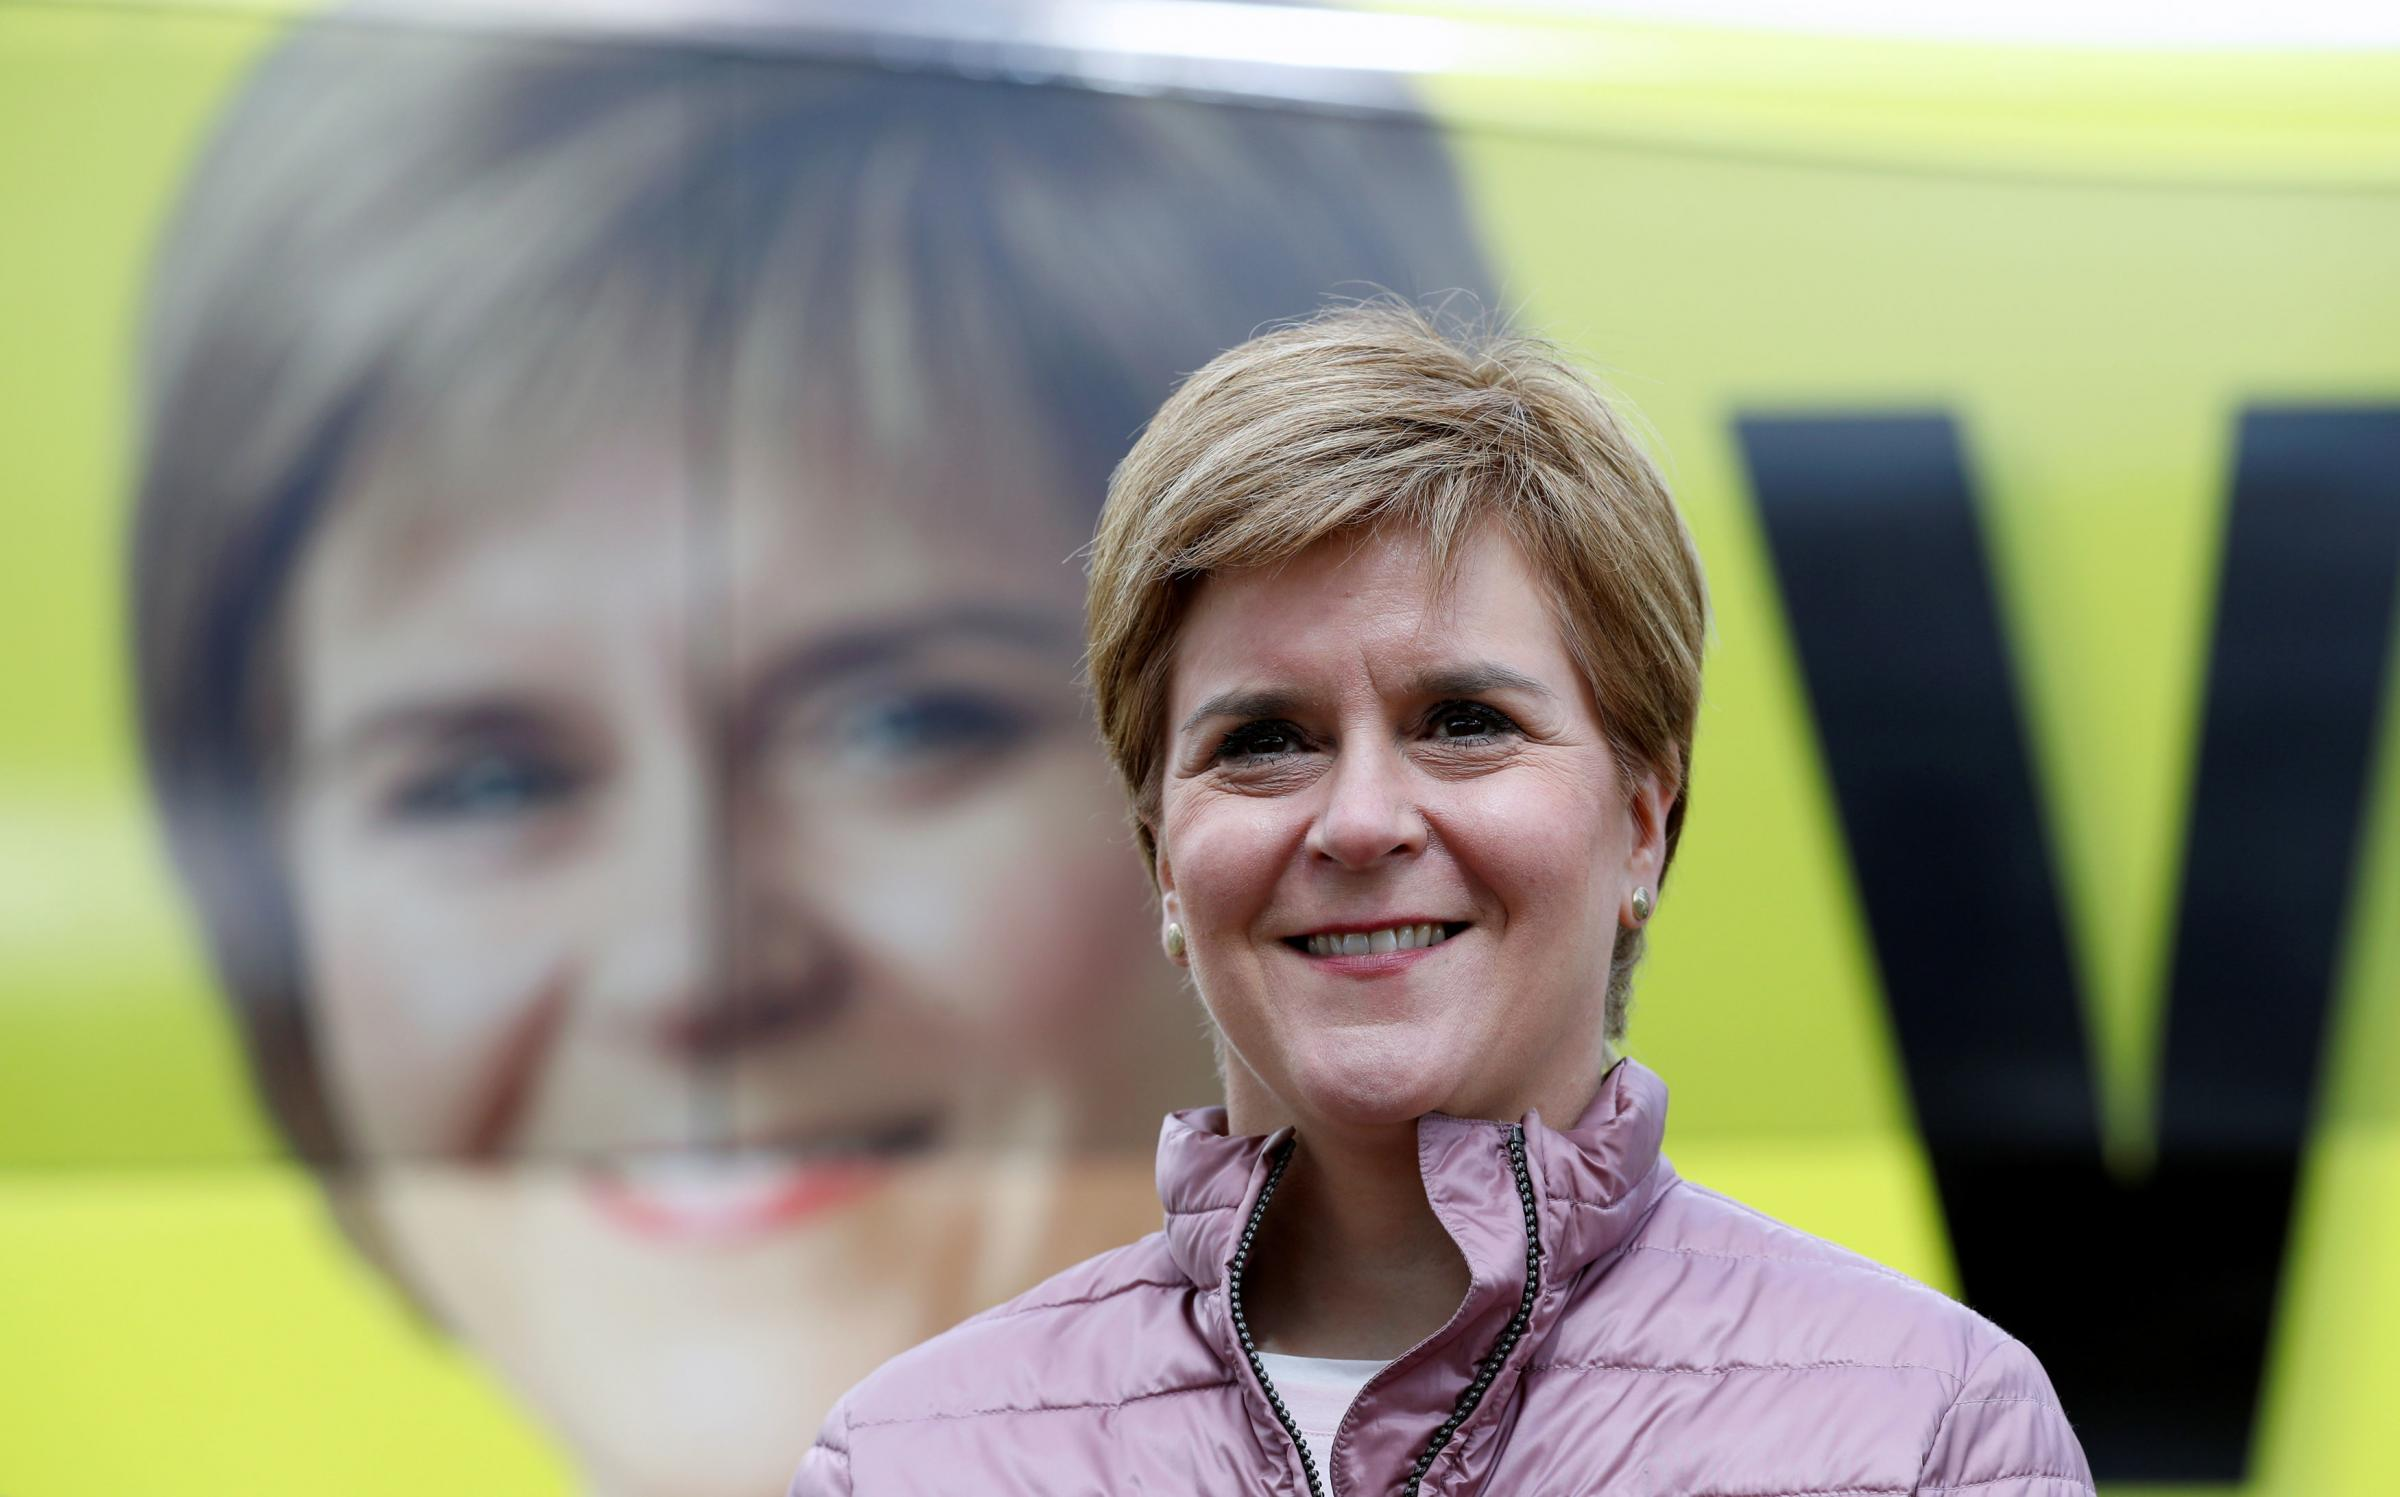 'Gaun yersel': Nicola Sturgeon hailed for no-nonsense response to right-wing ambush